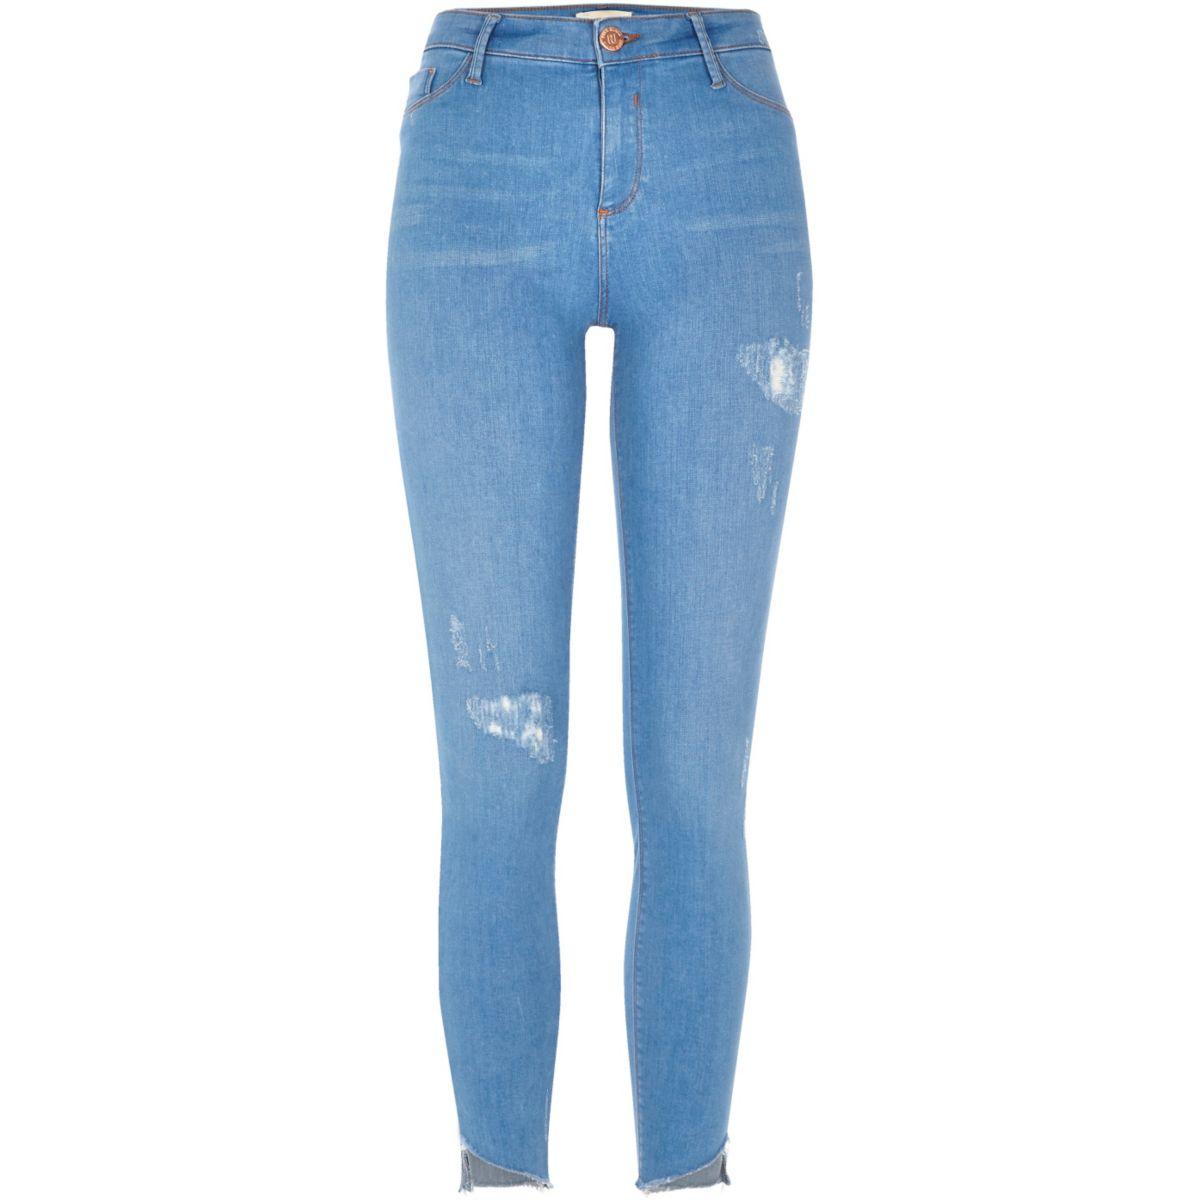 Bright blue Molly asymmetric hem jeans